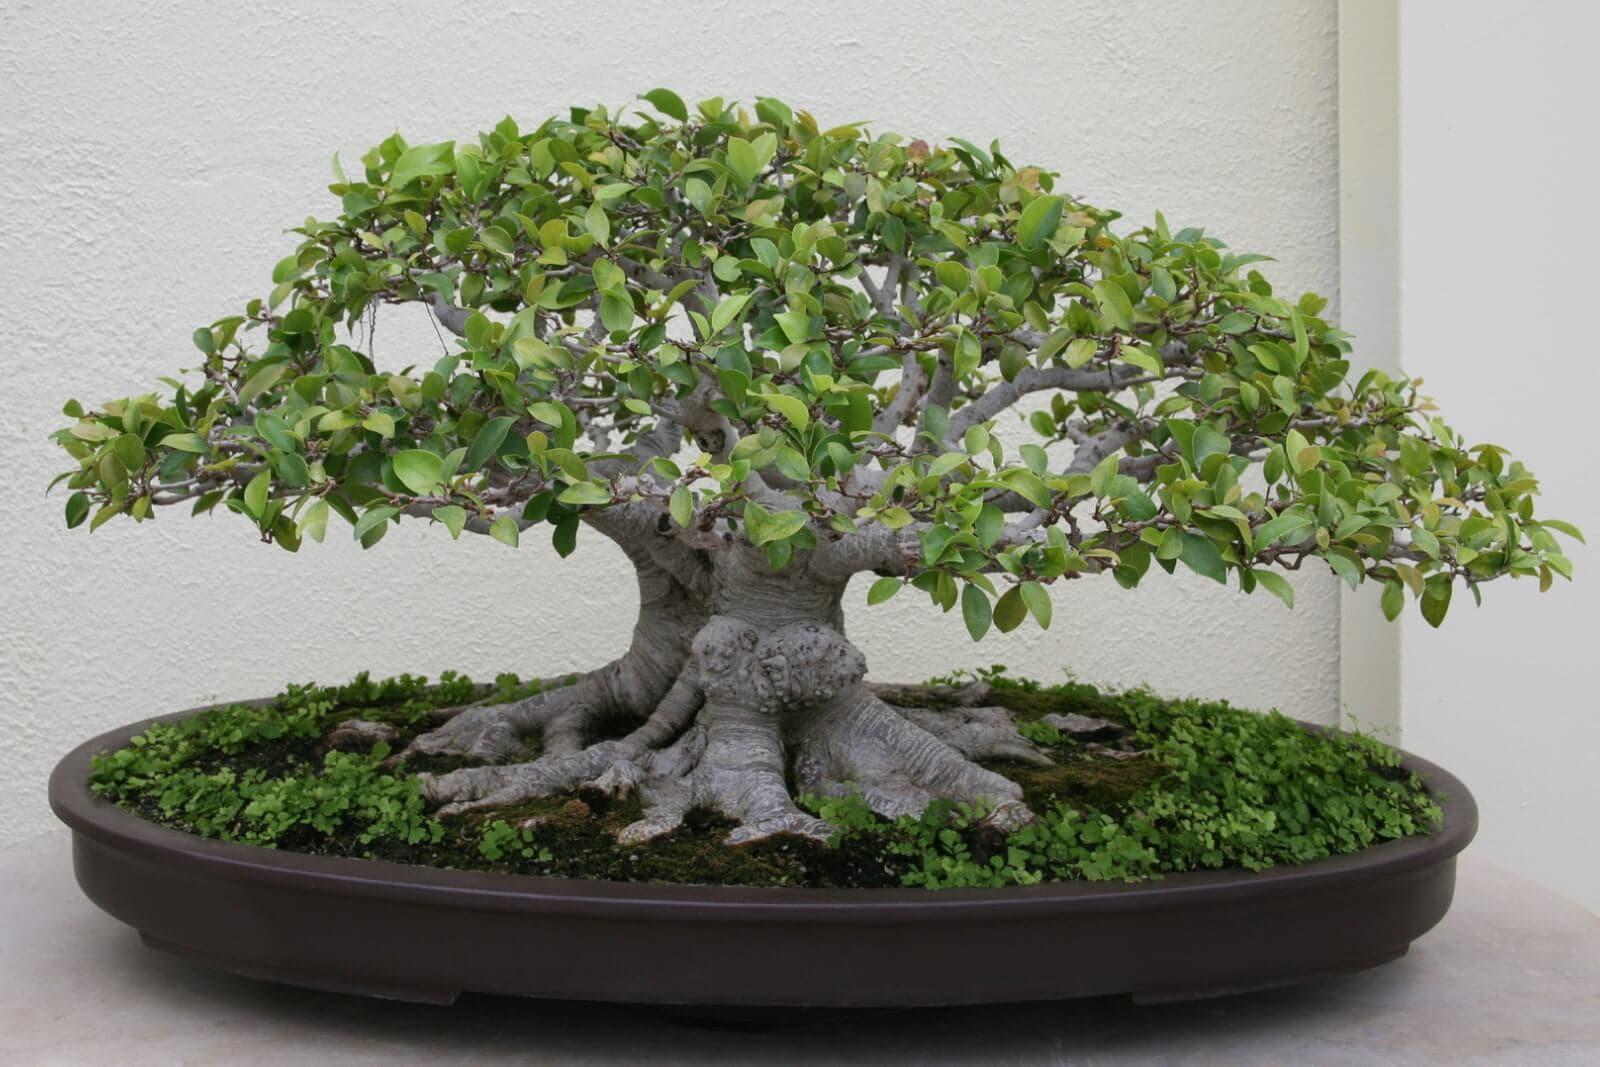 Ficus Microcarpa ginseng ikea 3